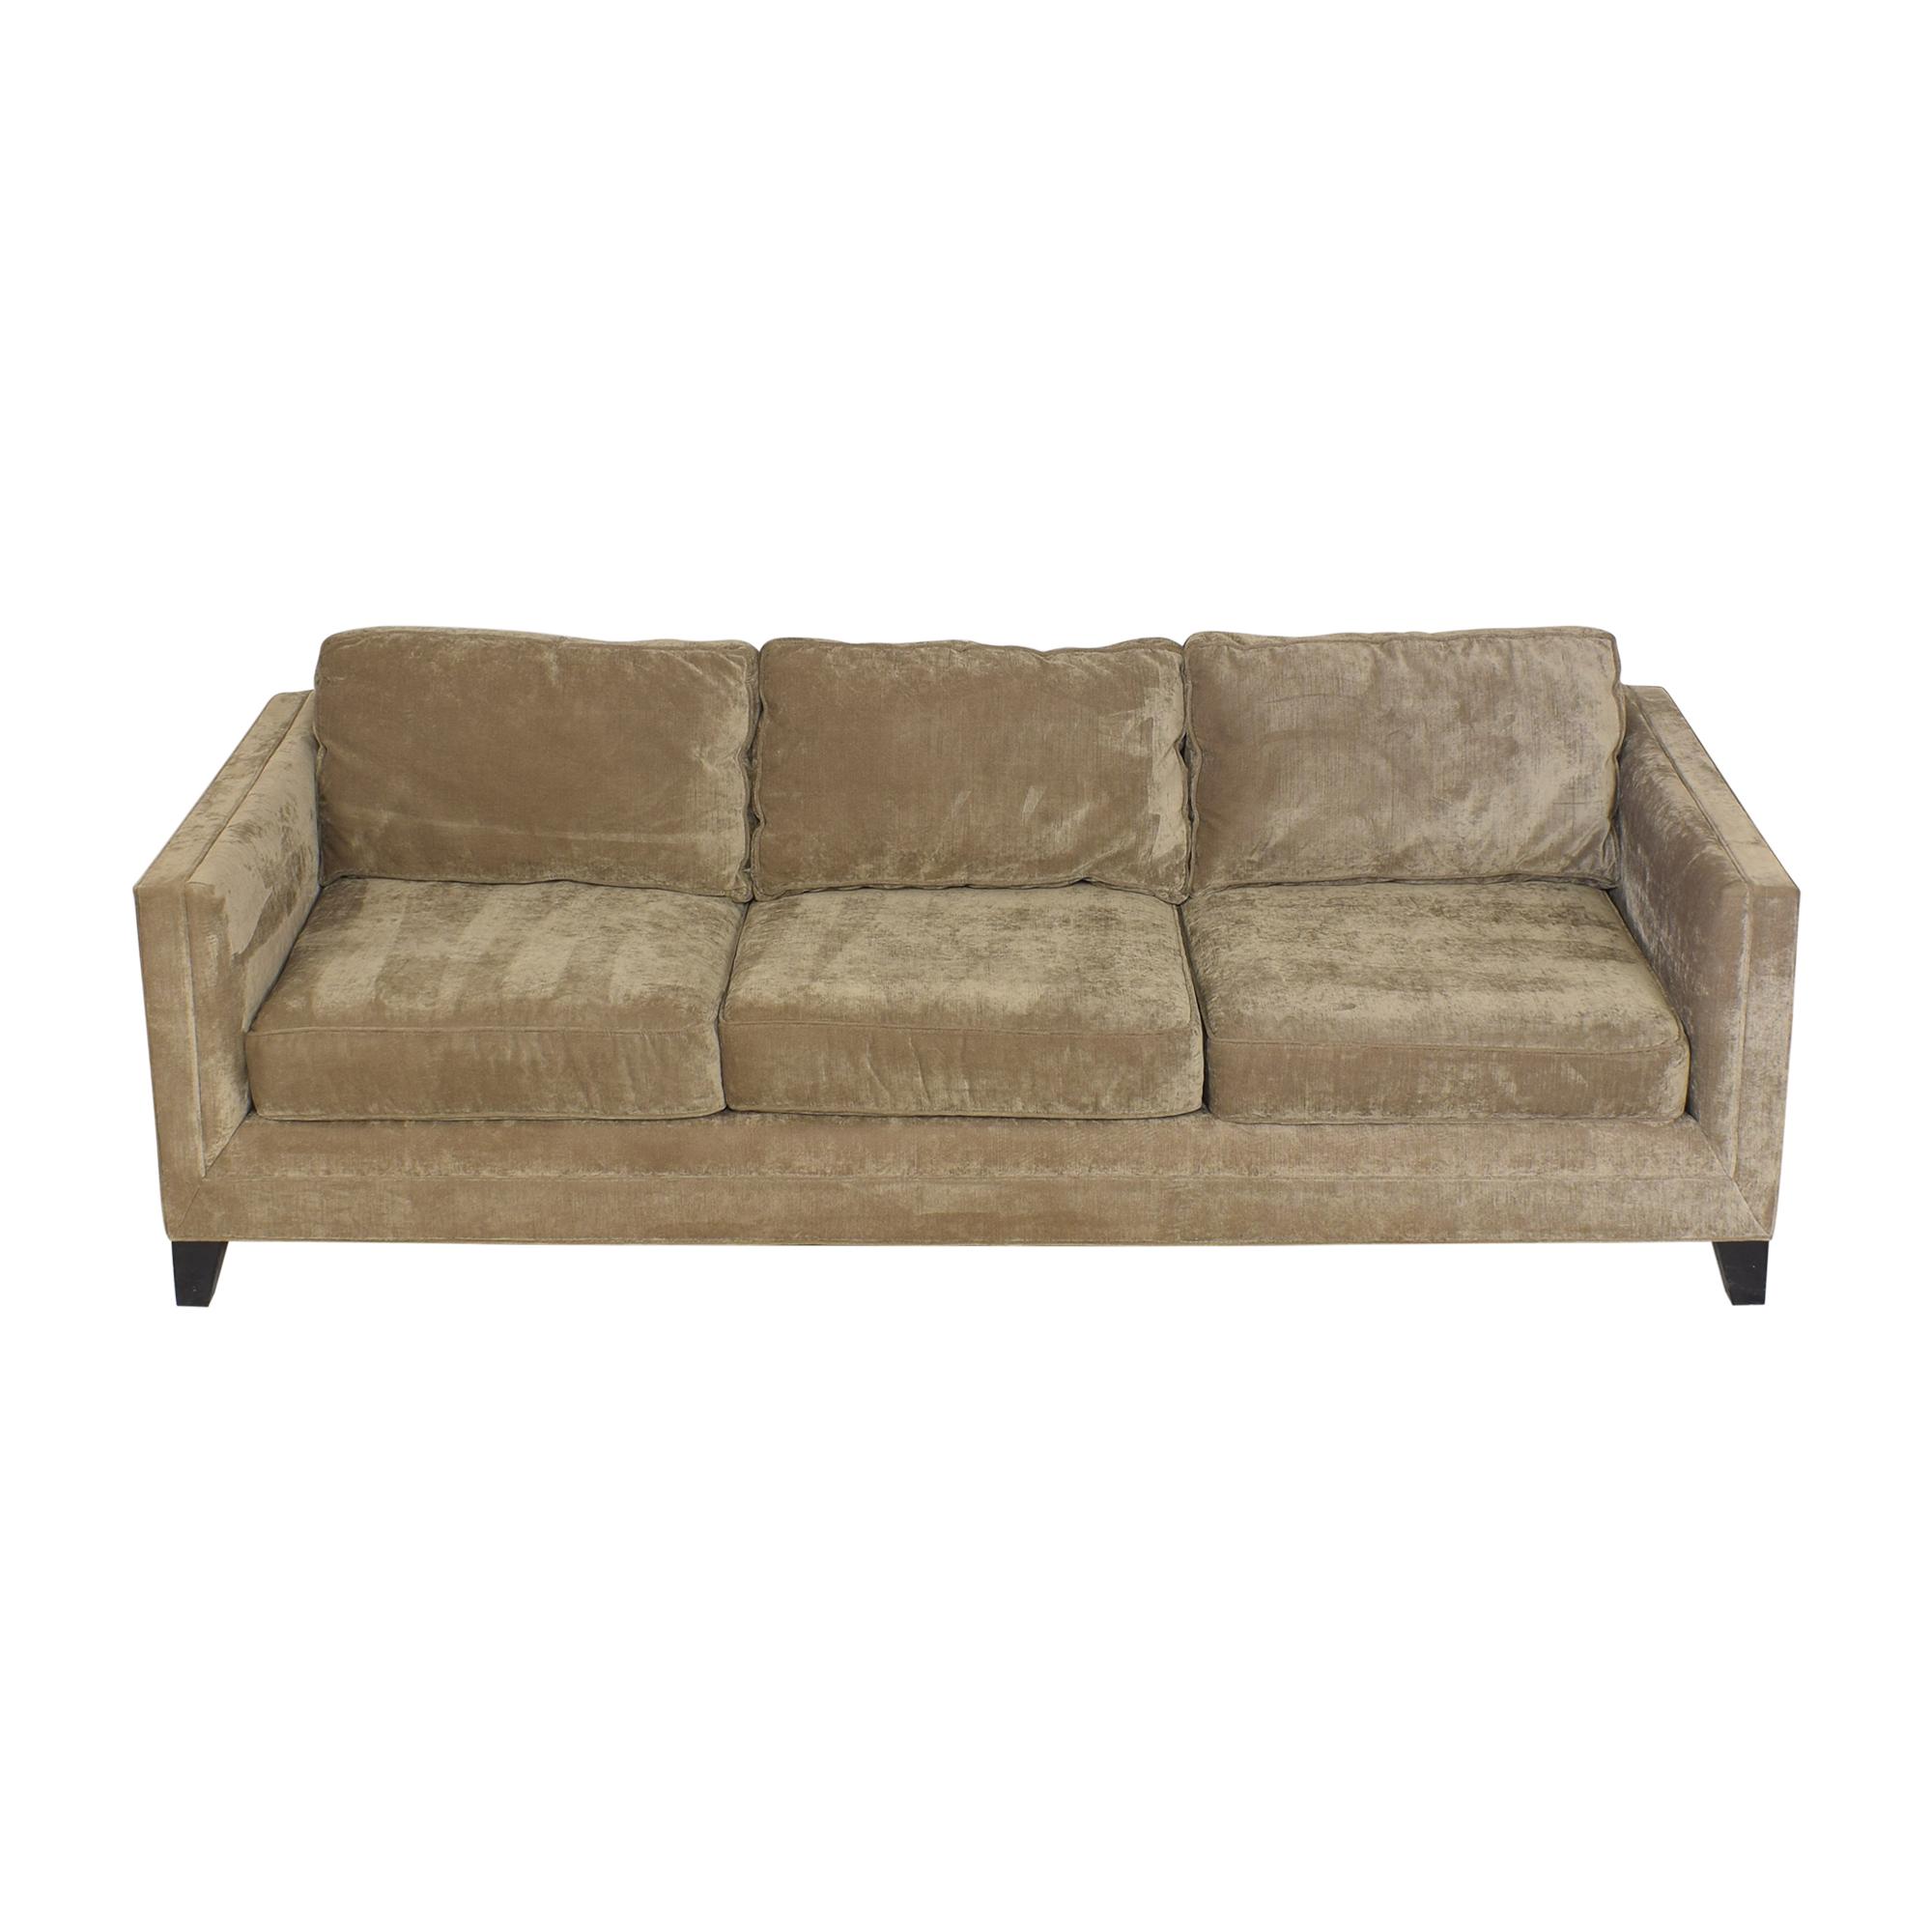 shop Mitchell Gold + Bob Williams Reese Three Cushion Sofa Mitchell Gold + Bob Williams Classic Sofas